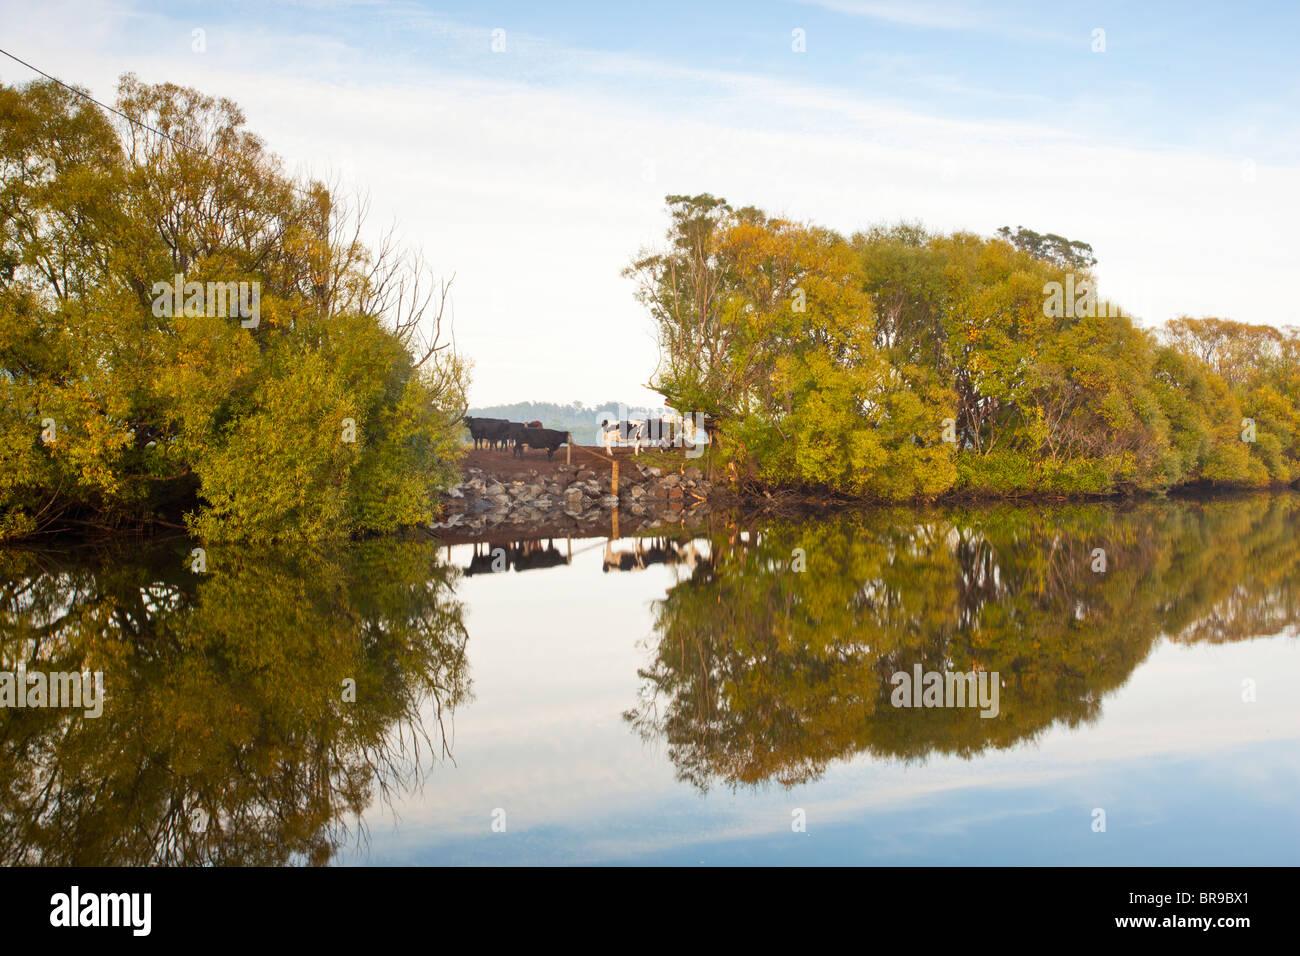 Early morning on the Mersey River, Latrobe, Devonport, Tasmania - Stock Image